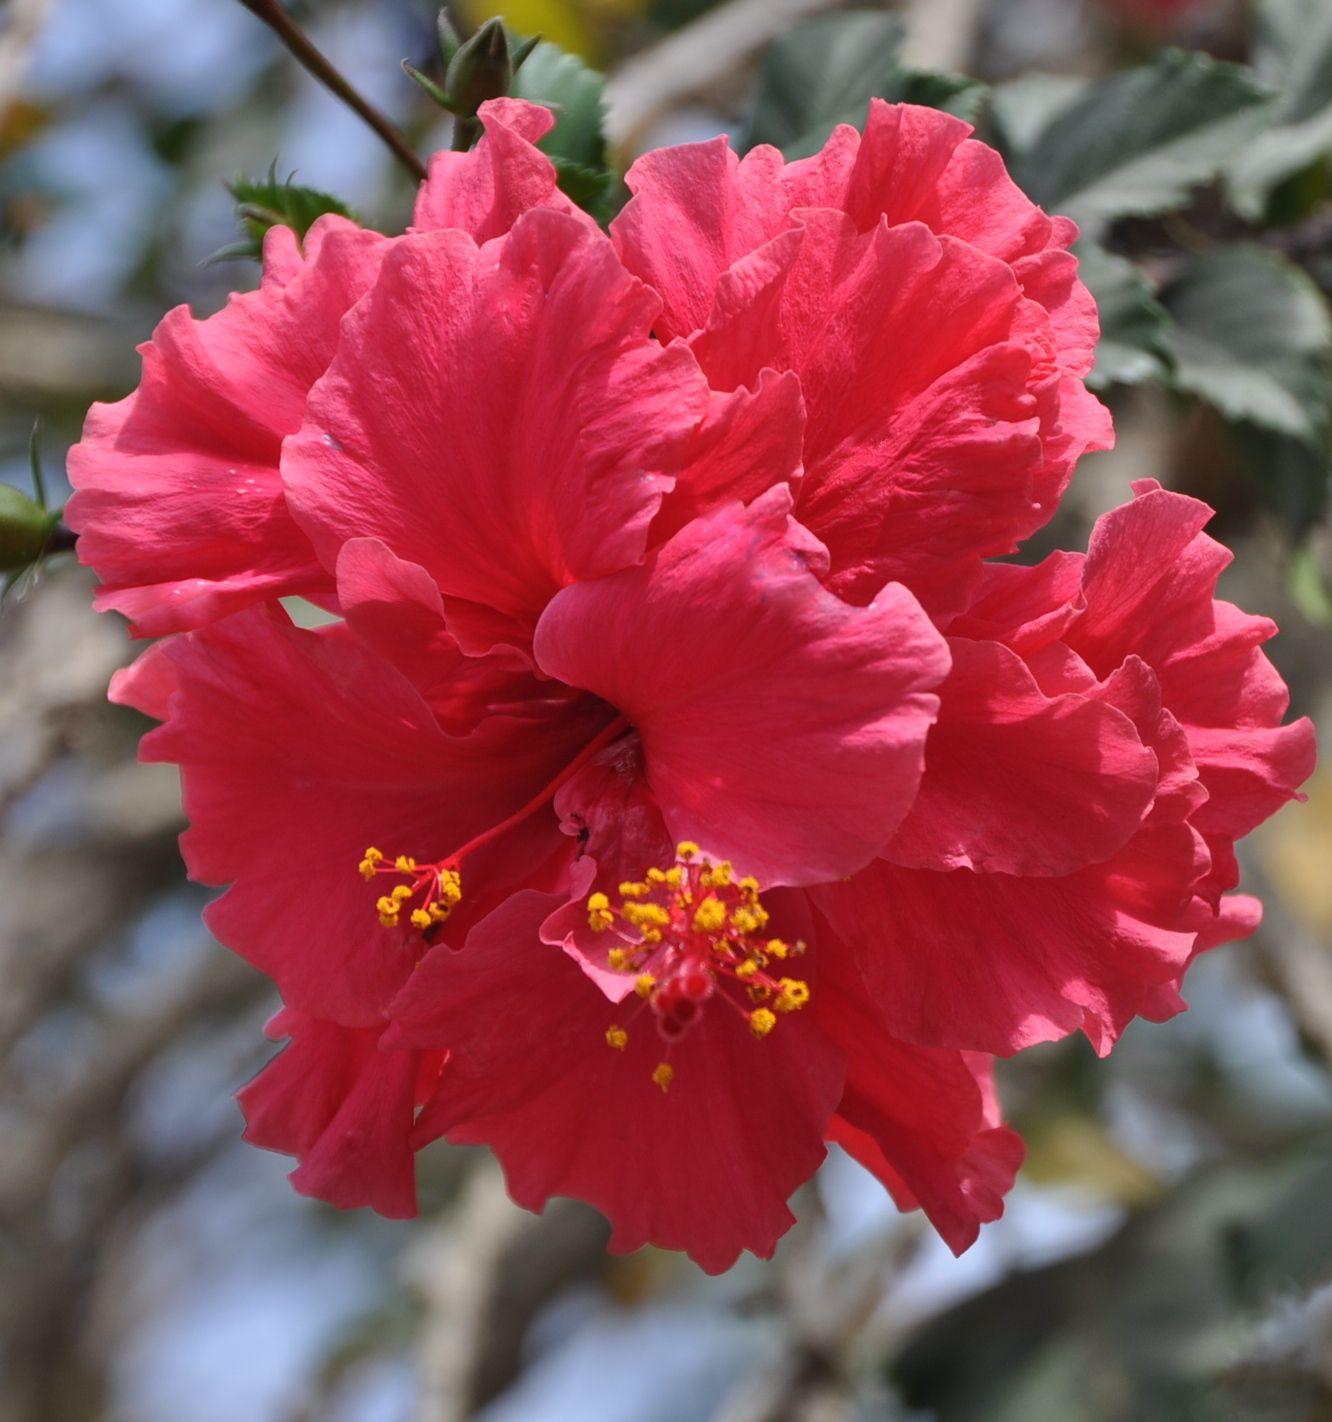 Double red hibiscus of Yelapa, Mexico Hibiscus plant